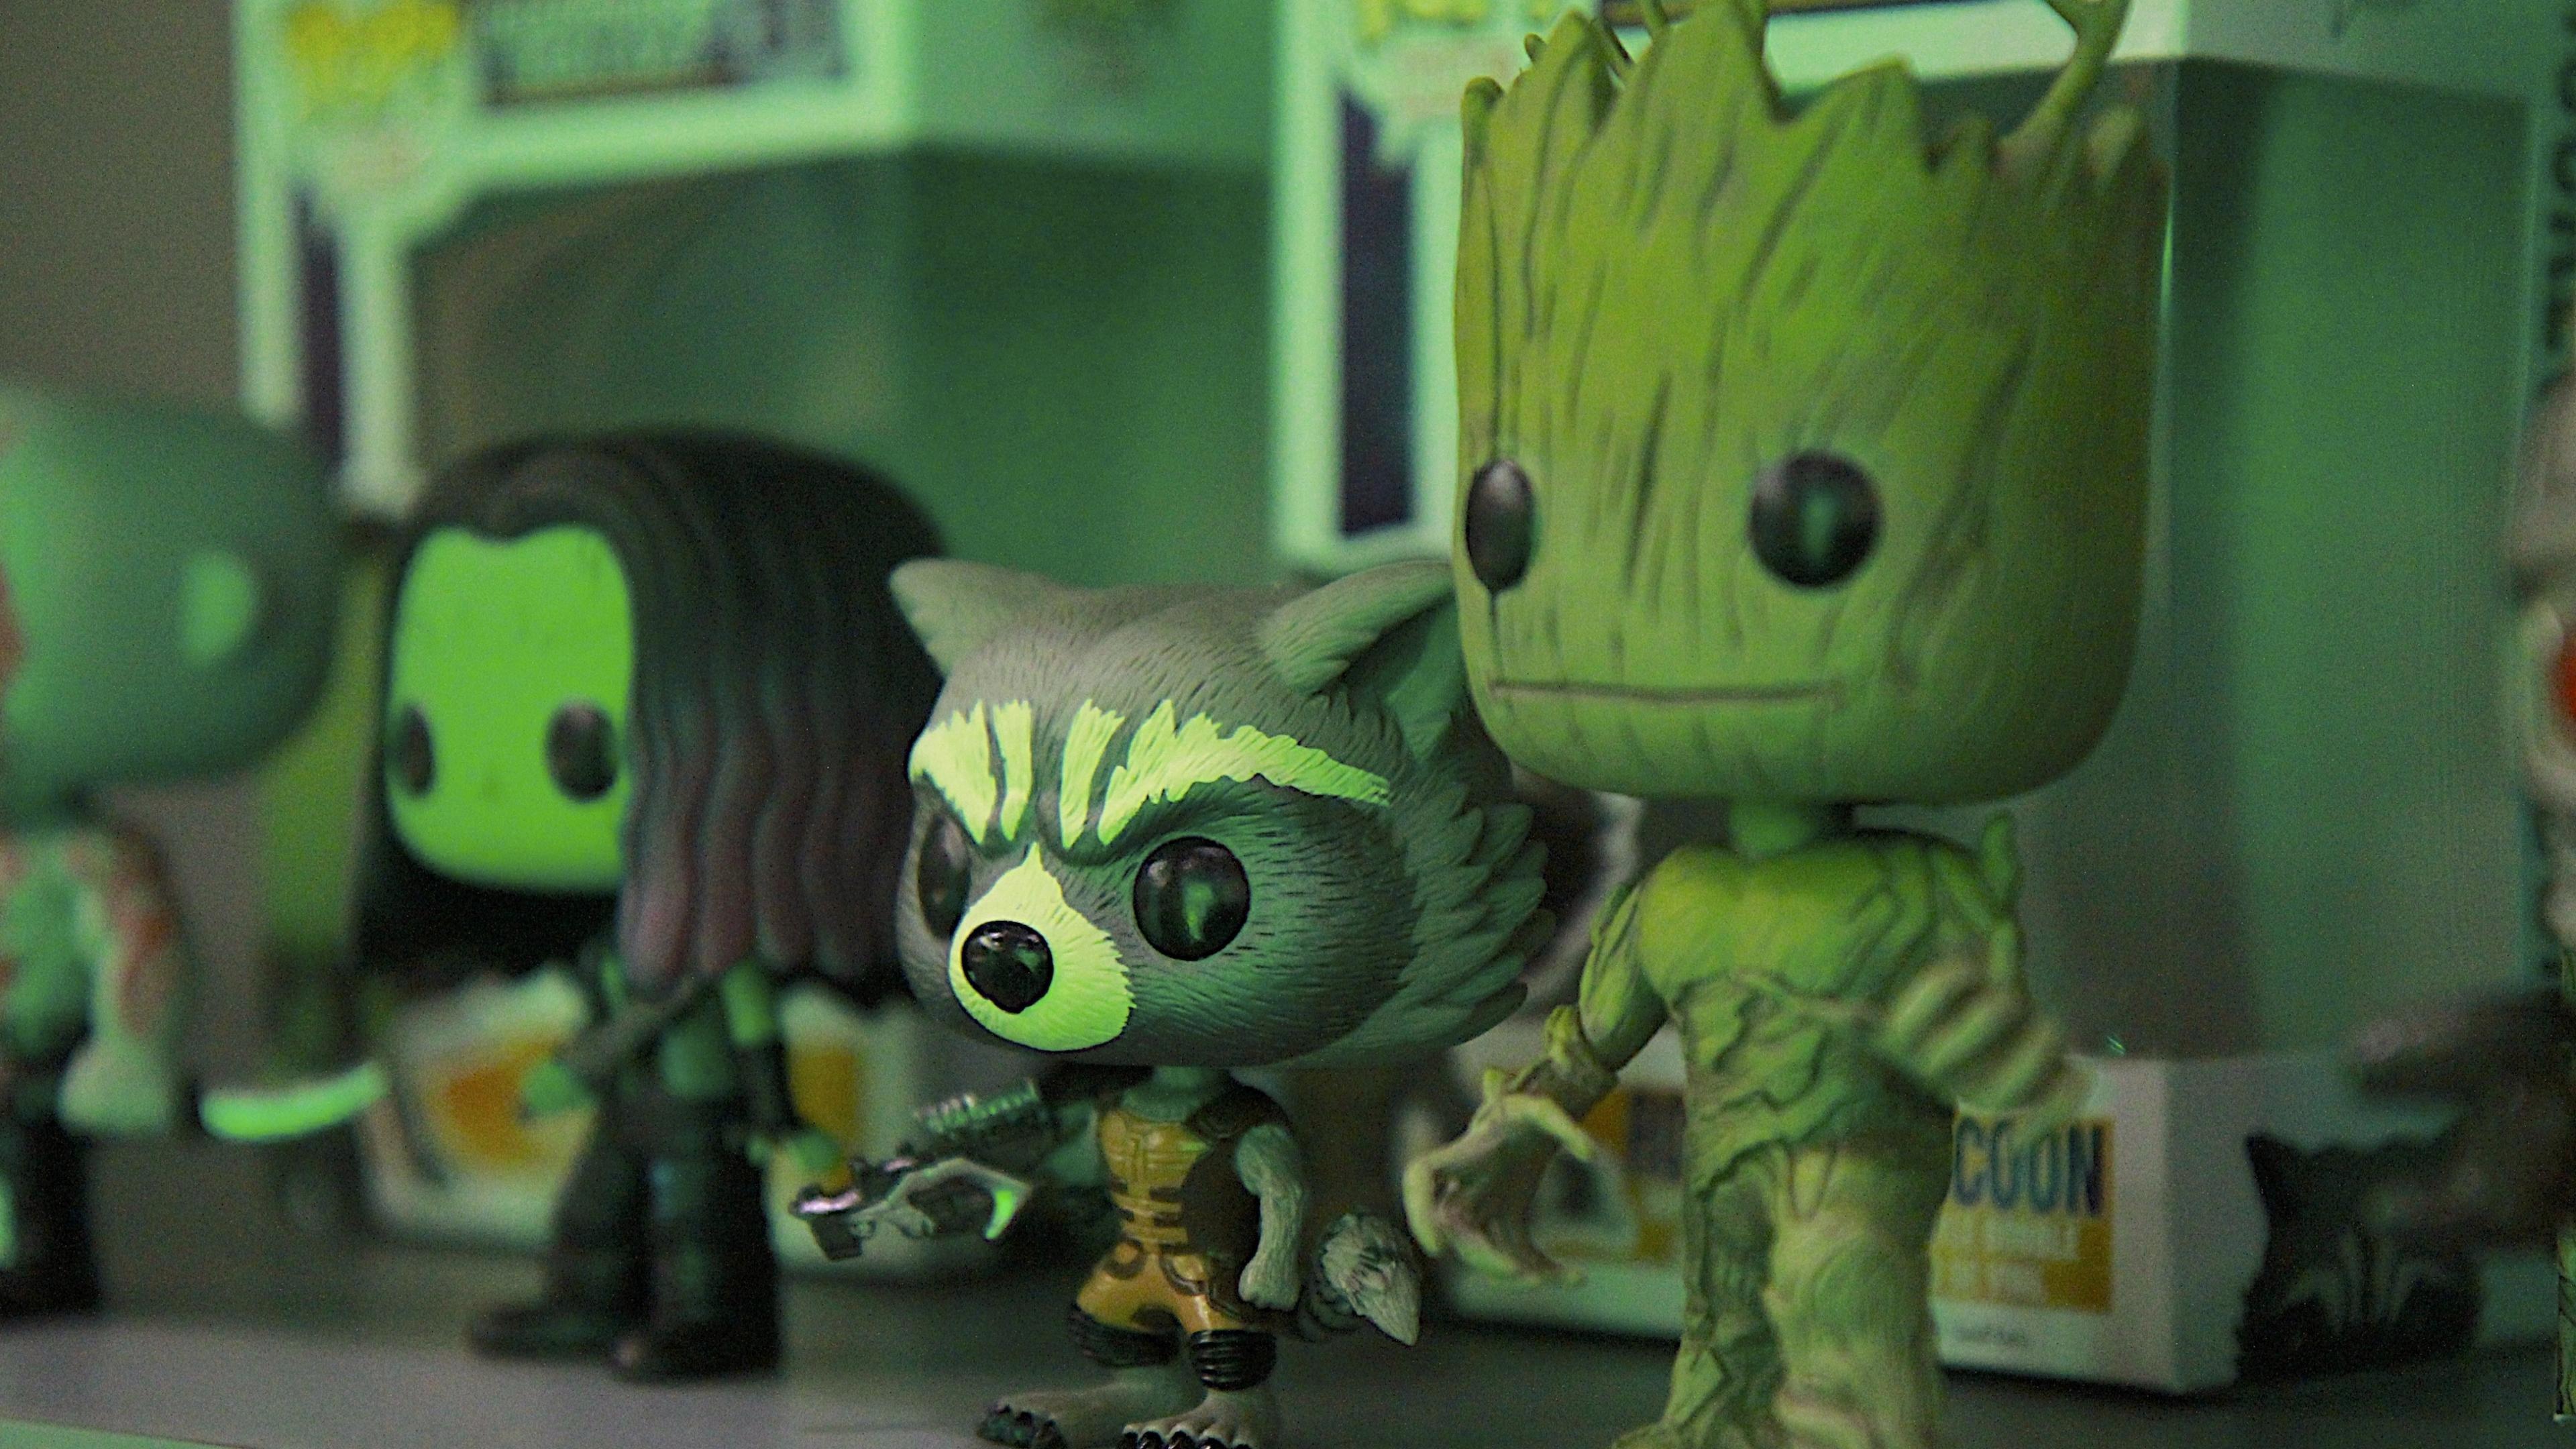 Guardians Of The Galaxy Wallpapers 3840x2160 Ultra Hd 4k Desktop